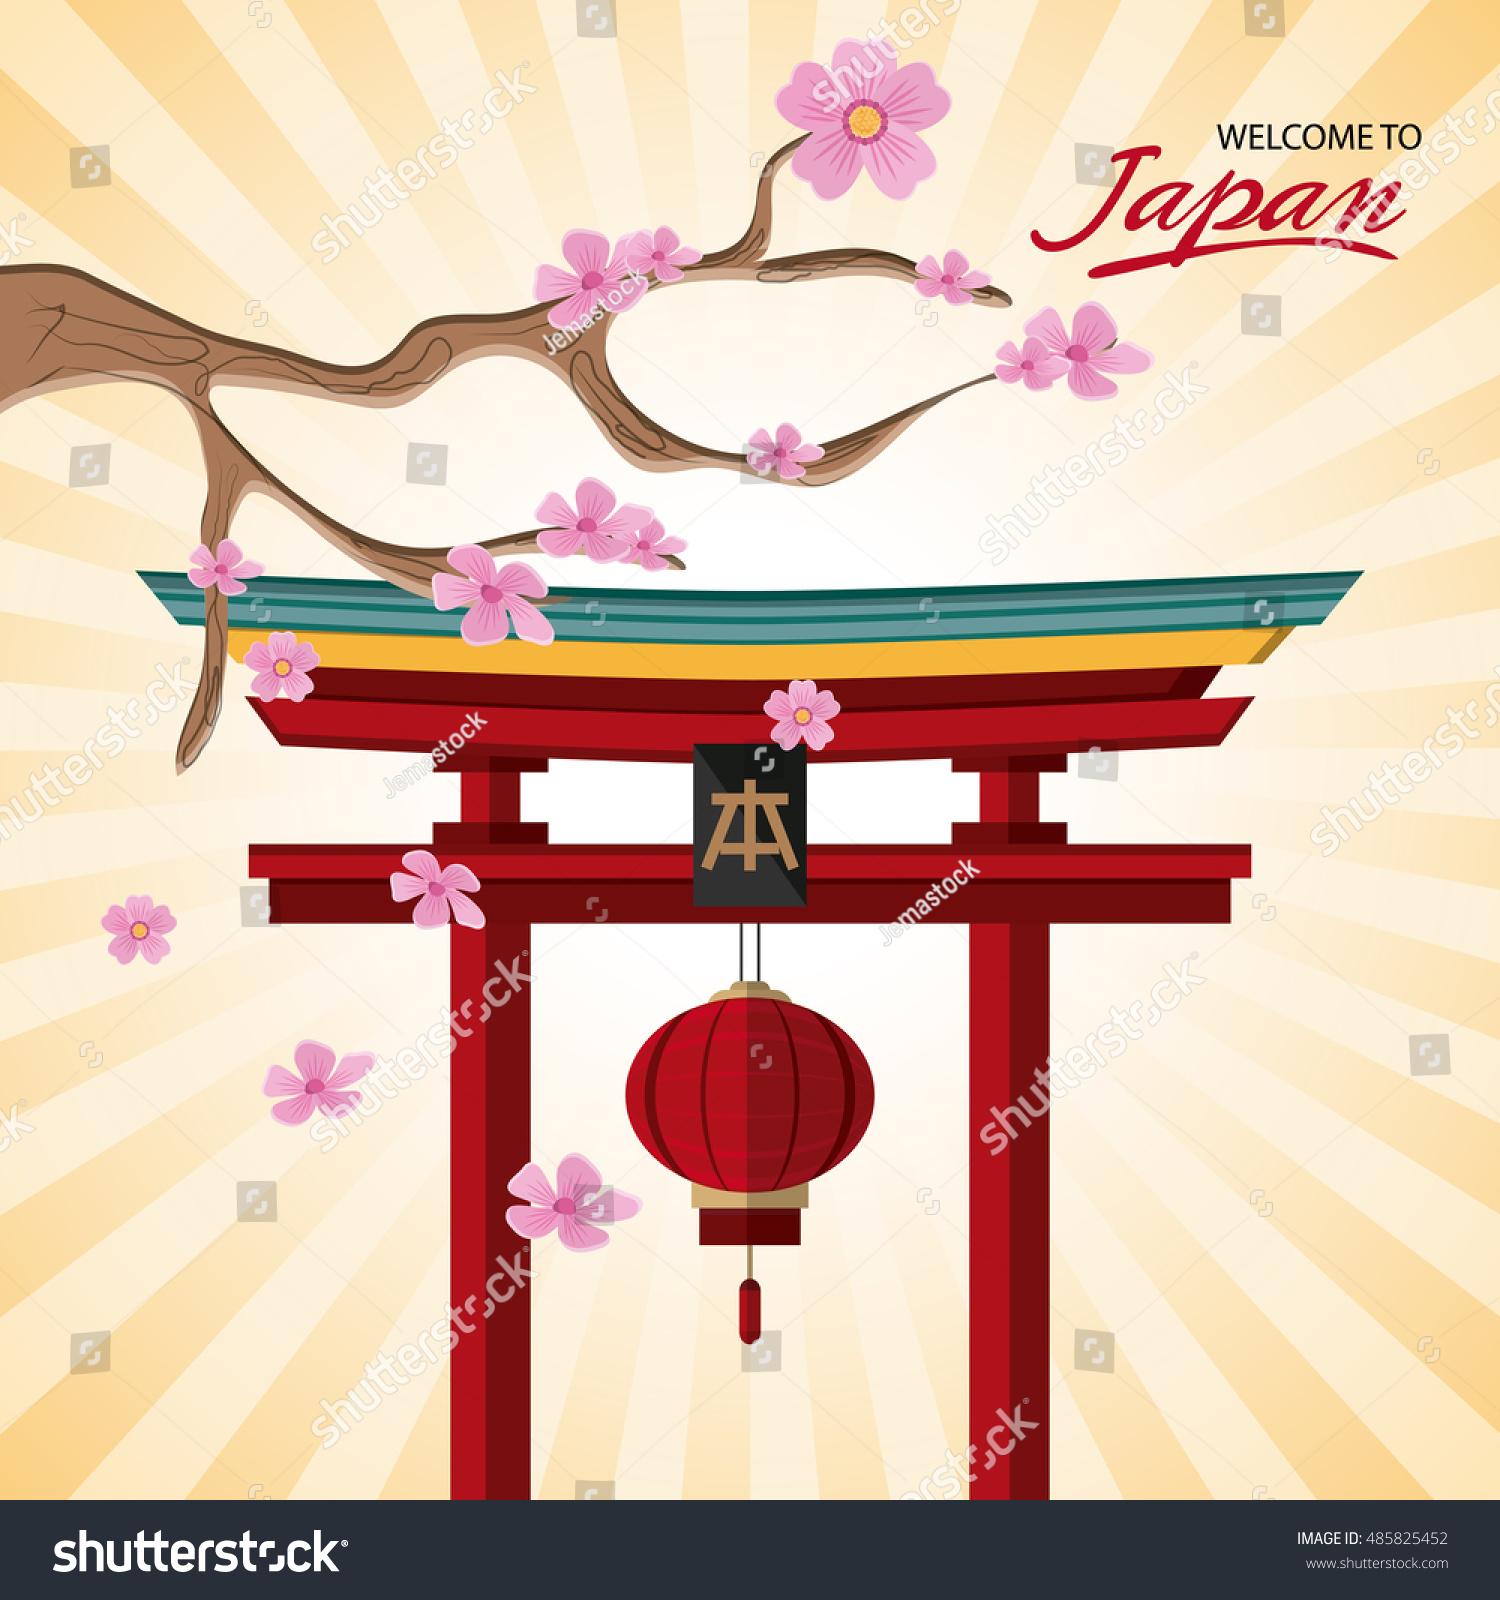 Japan culture and landmark design stock vector 485825452 for Landmark design